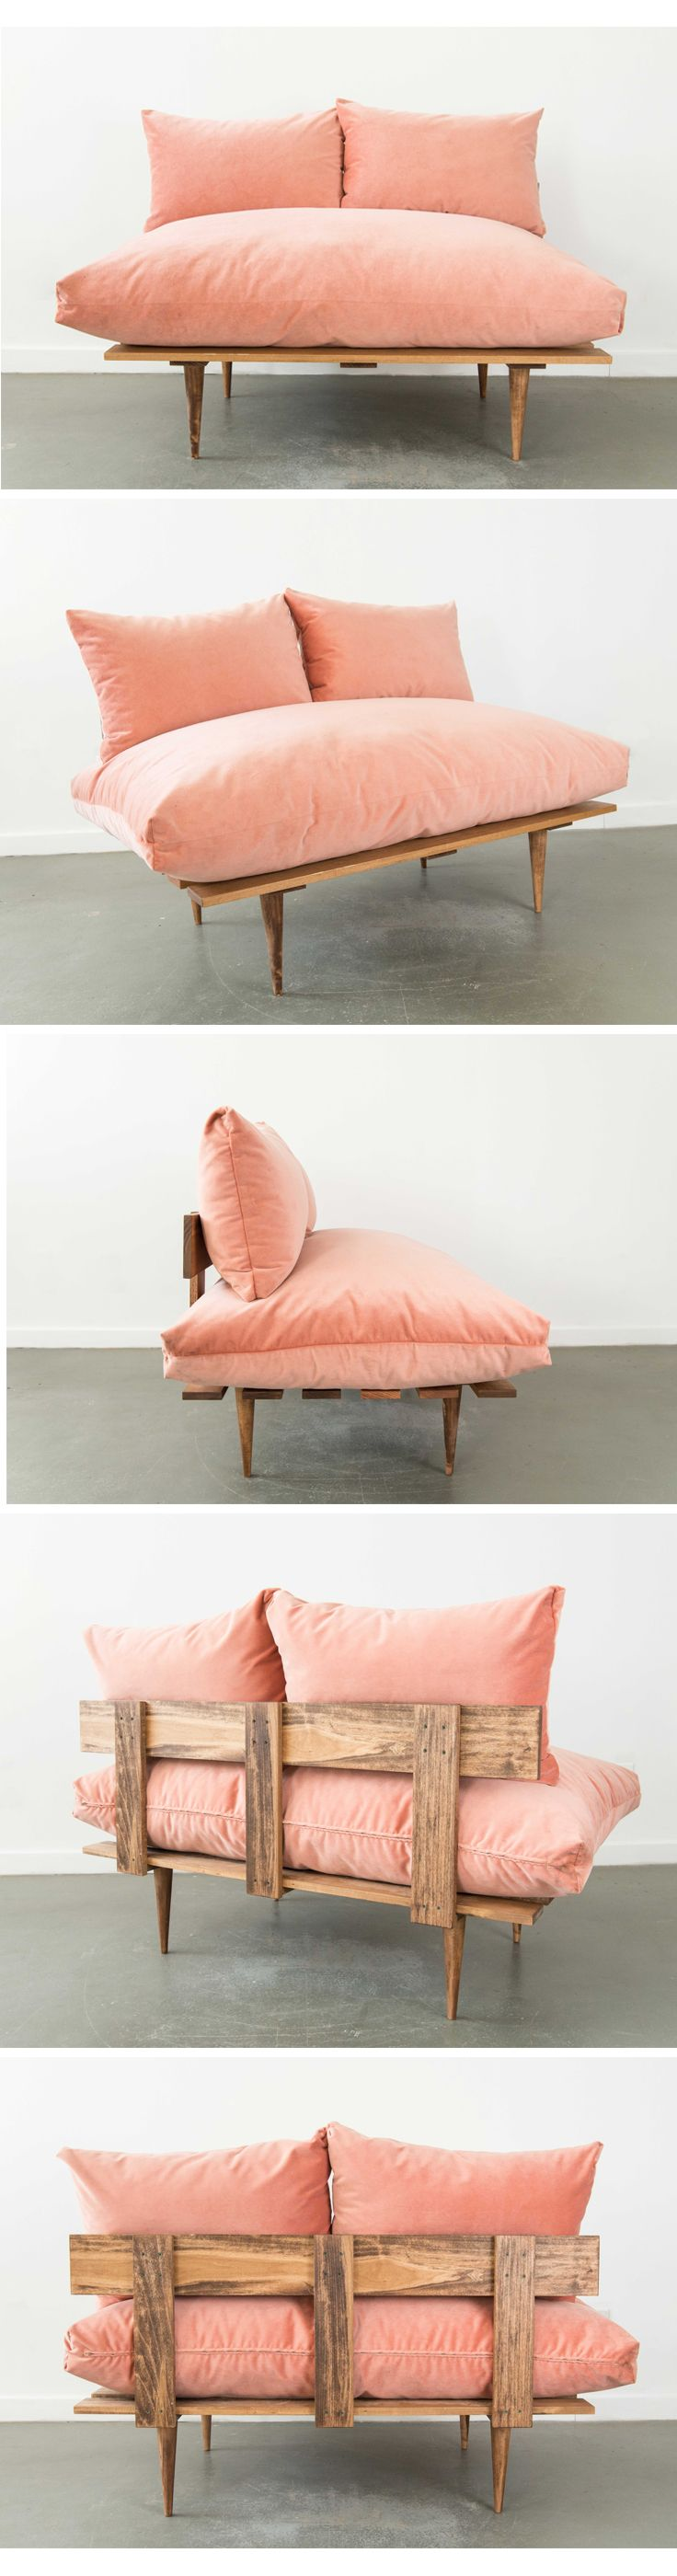 165 best | Industrial Design | images on Pinterest | Home ideas ...